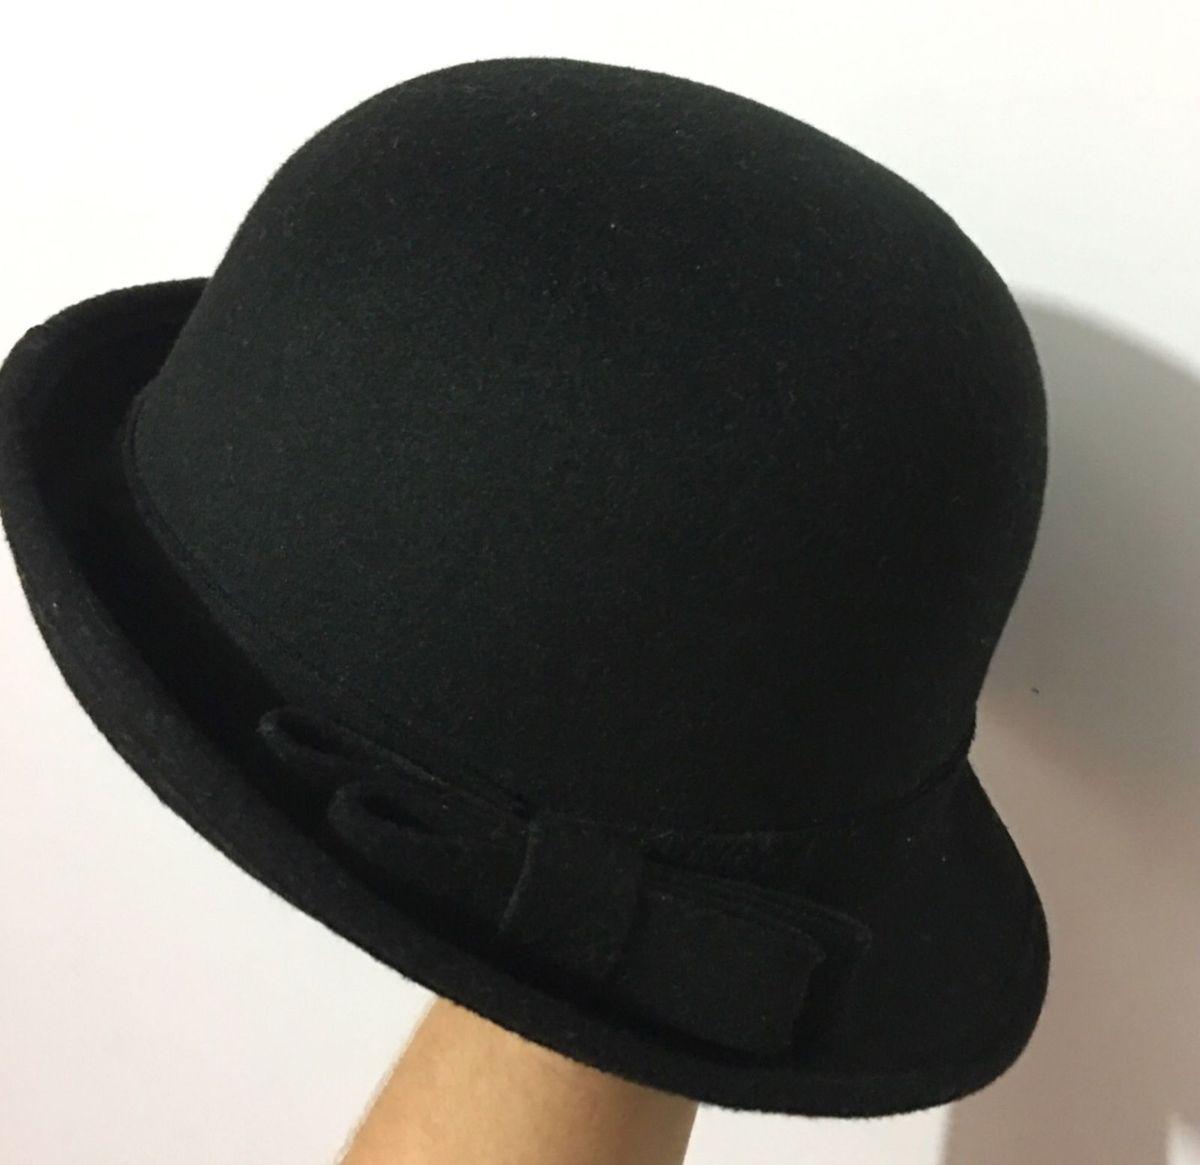 chapéu coco - chapeu sem marca.  Czm6ly9wag90b3muzw5qb2vplmnvbs5ici9wcm9kdwn0cy81ntqxntc3l2yxodljyji0m2vin2rkodezzduymjvlm2i2mtixyjyylmpwzw  ... aa29a544254